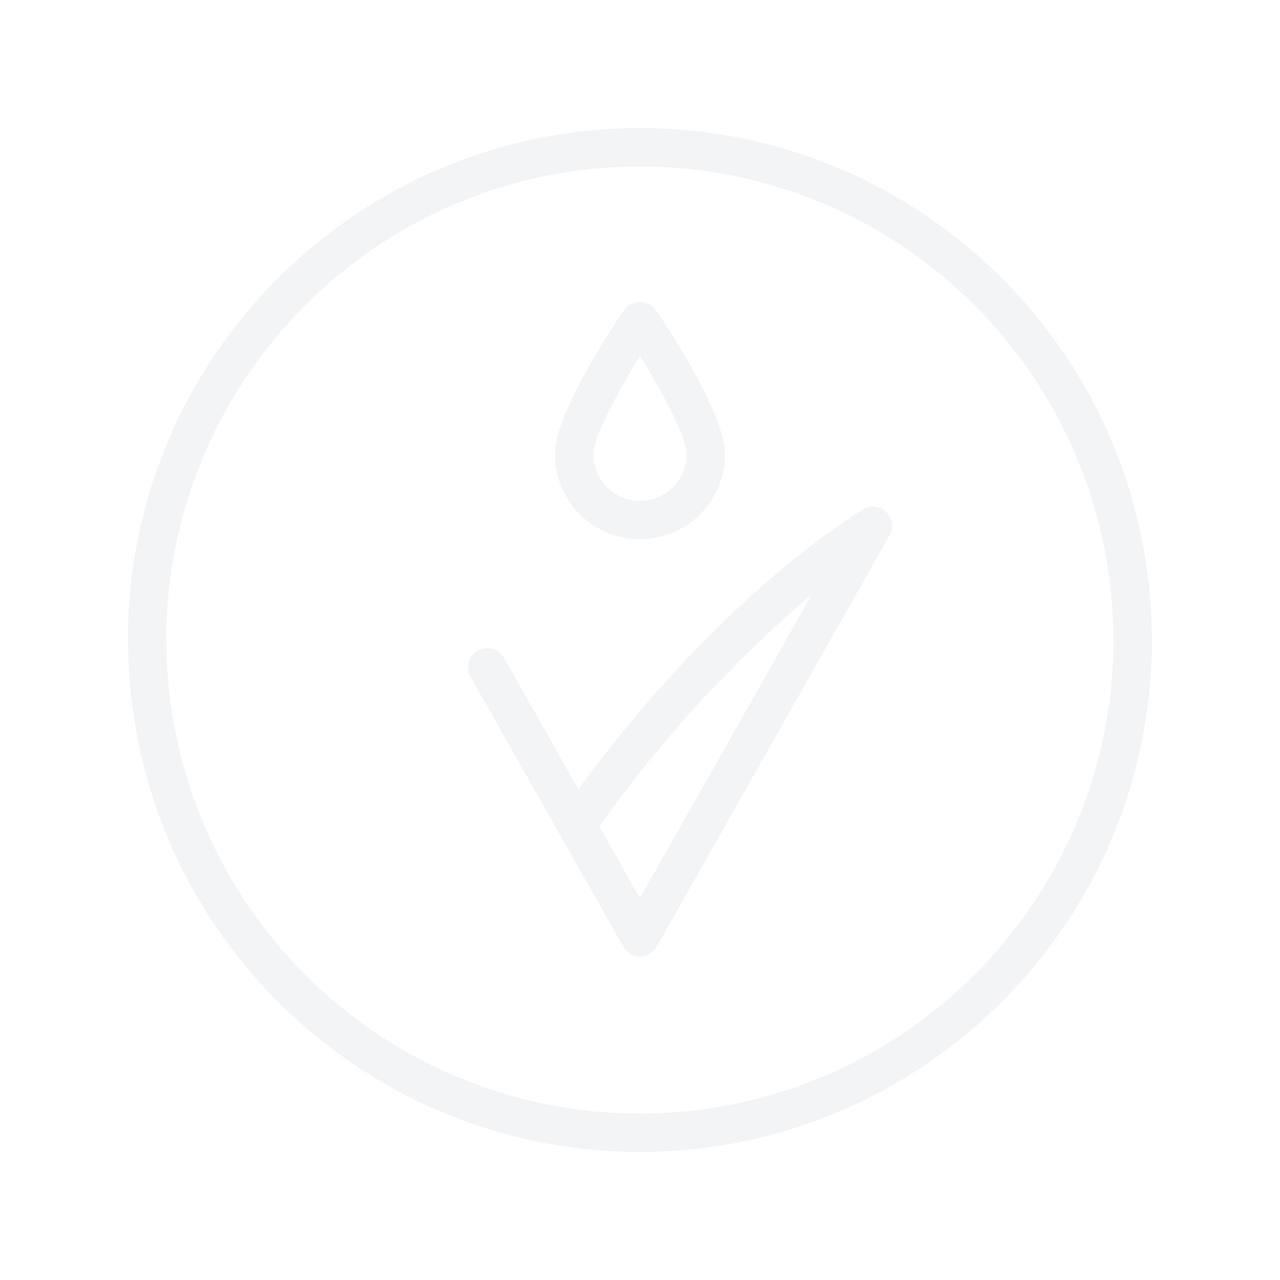 DR. BRONNERS Tea Tree Pure Castile Soap